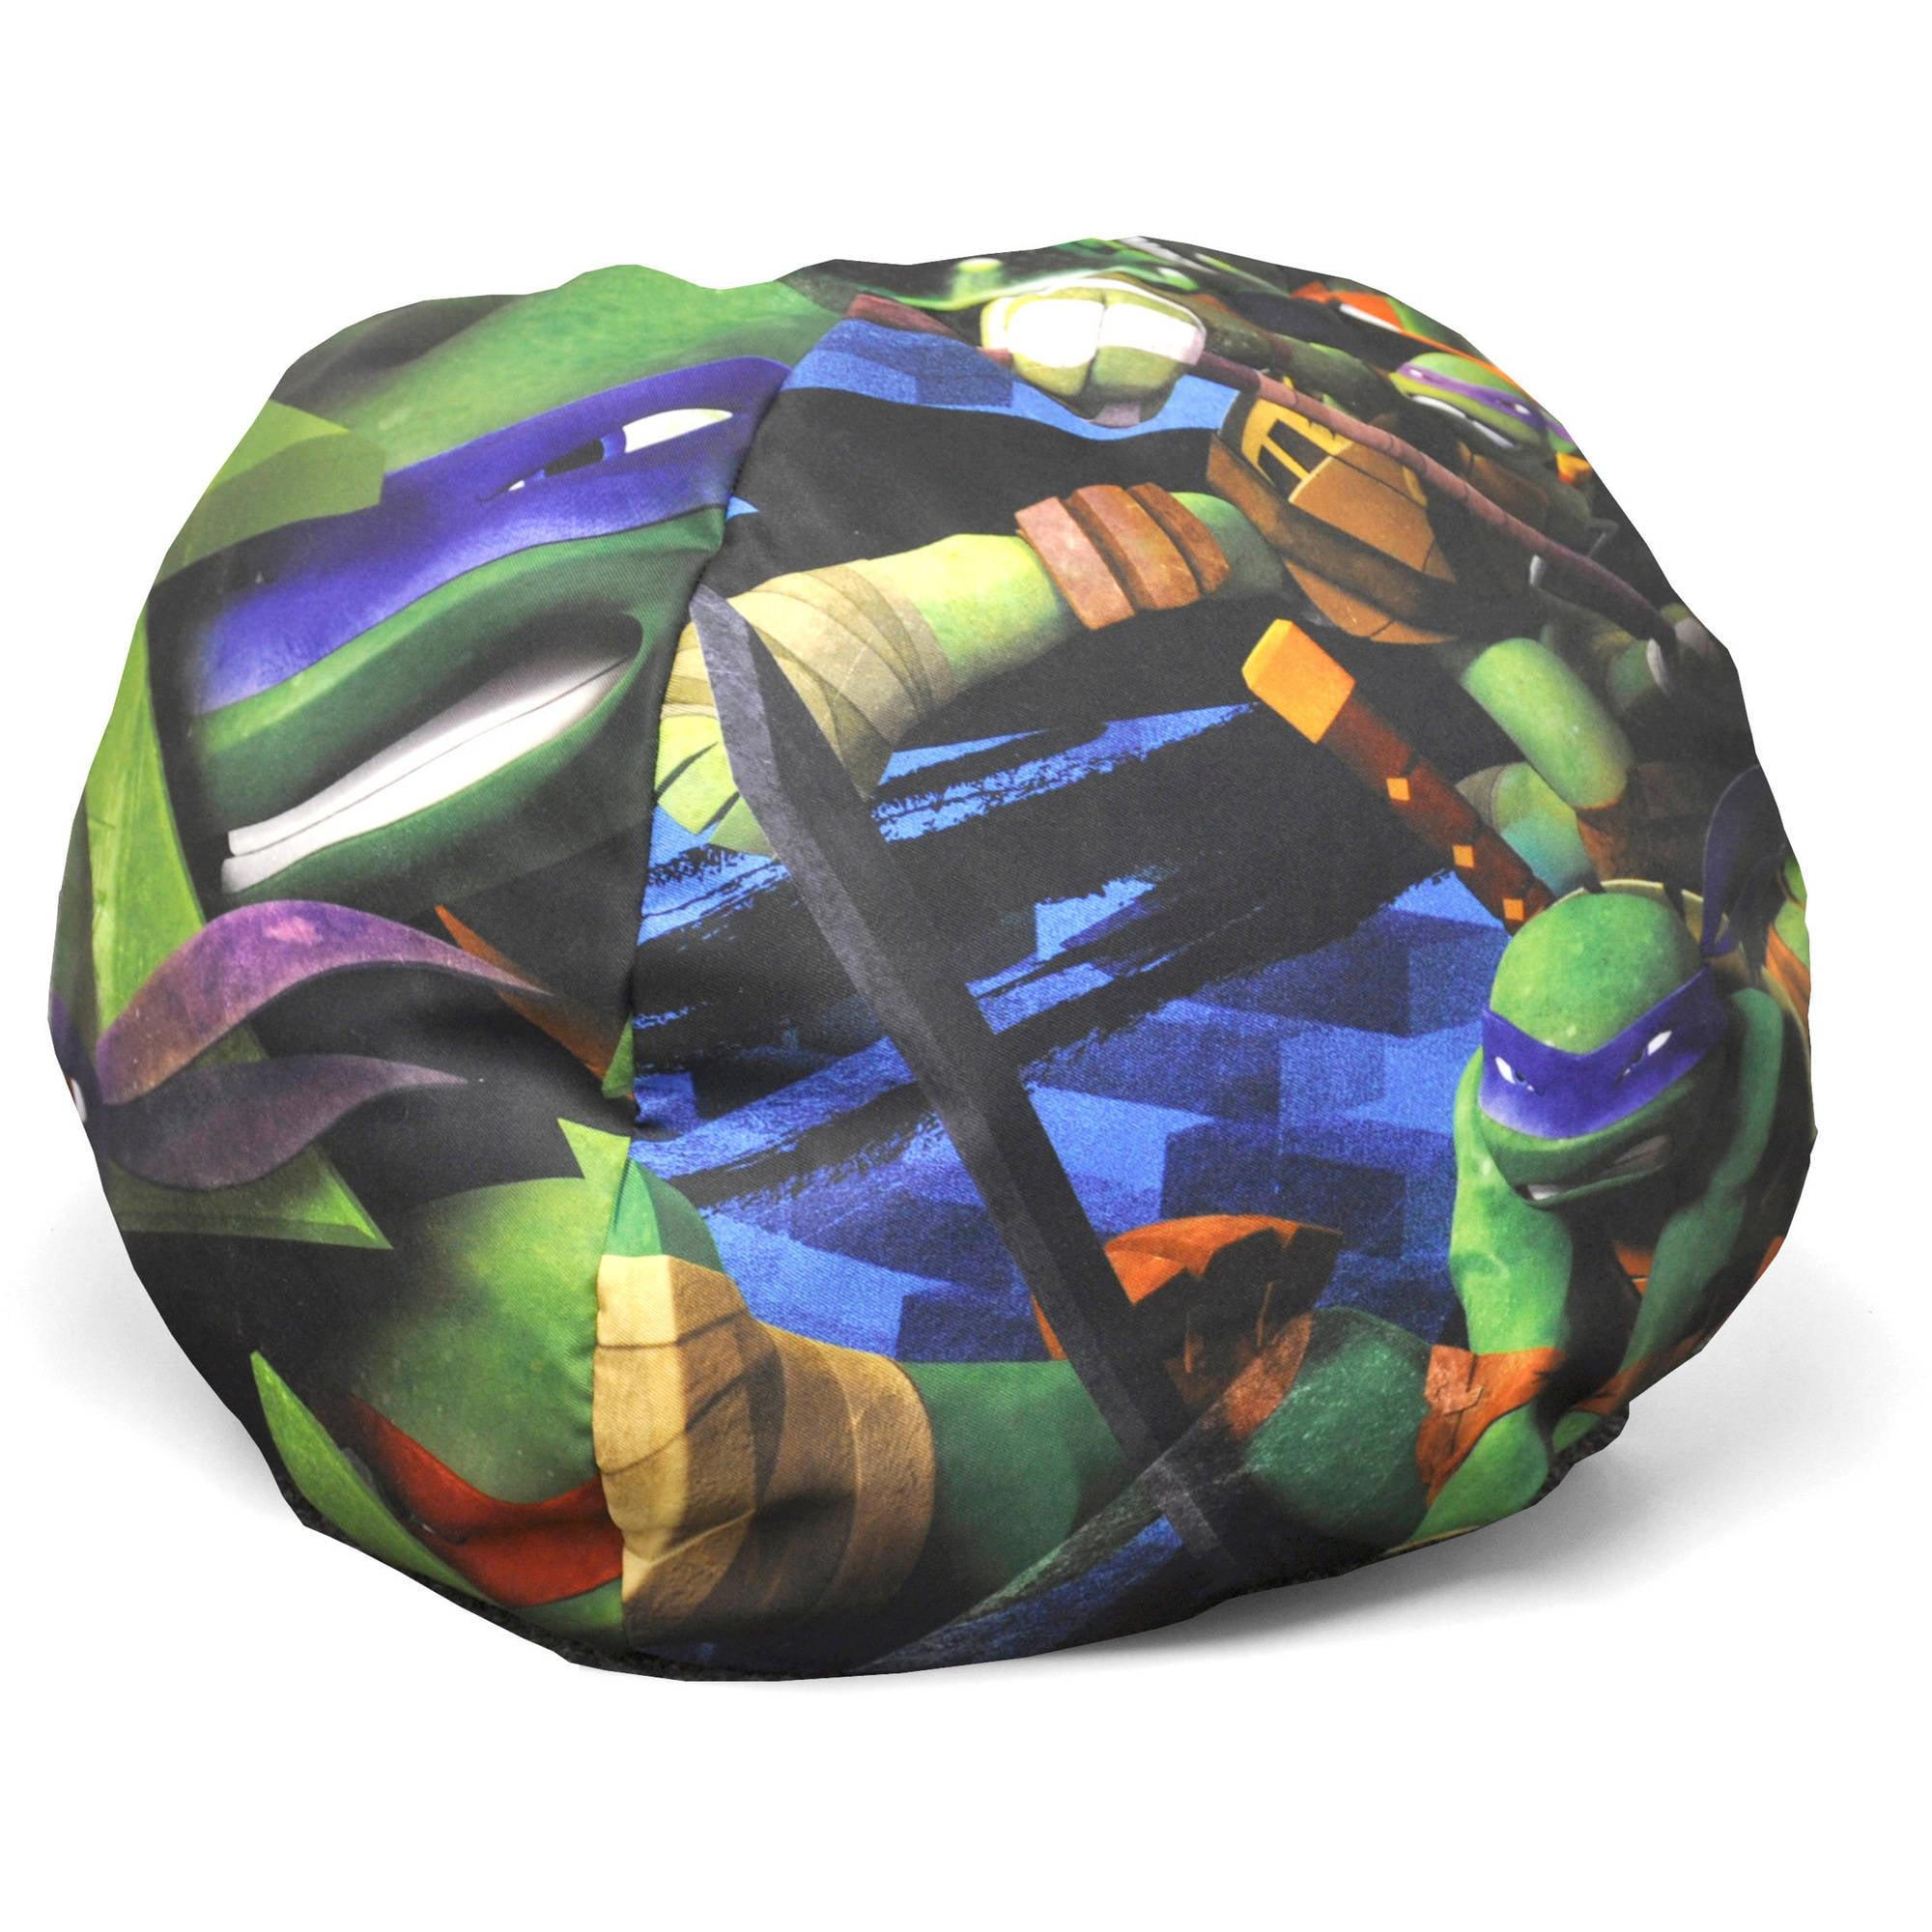 Nickelodeon Teenage Mutant Ninja Turtles Mini Round Bean Bag